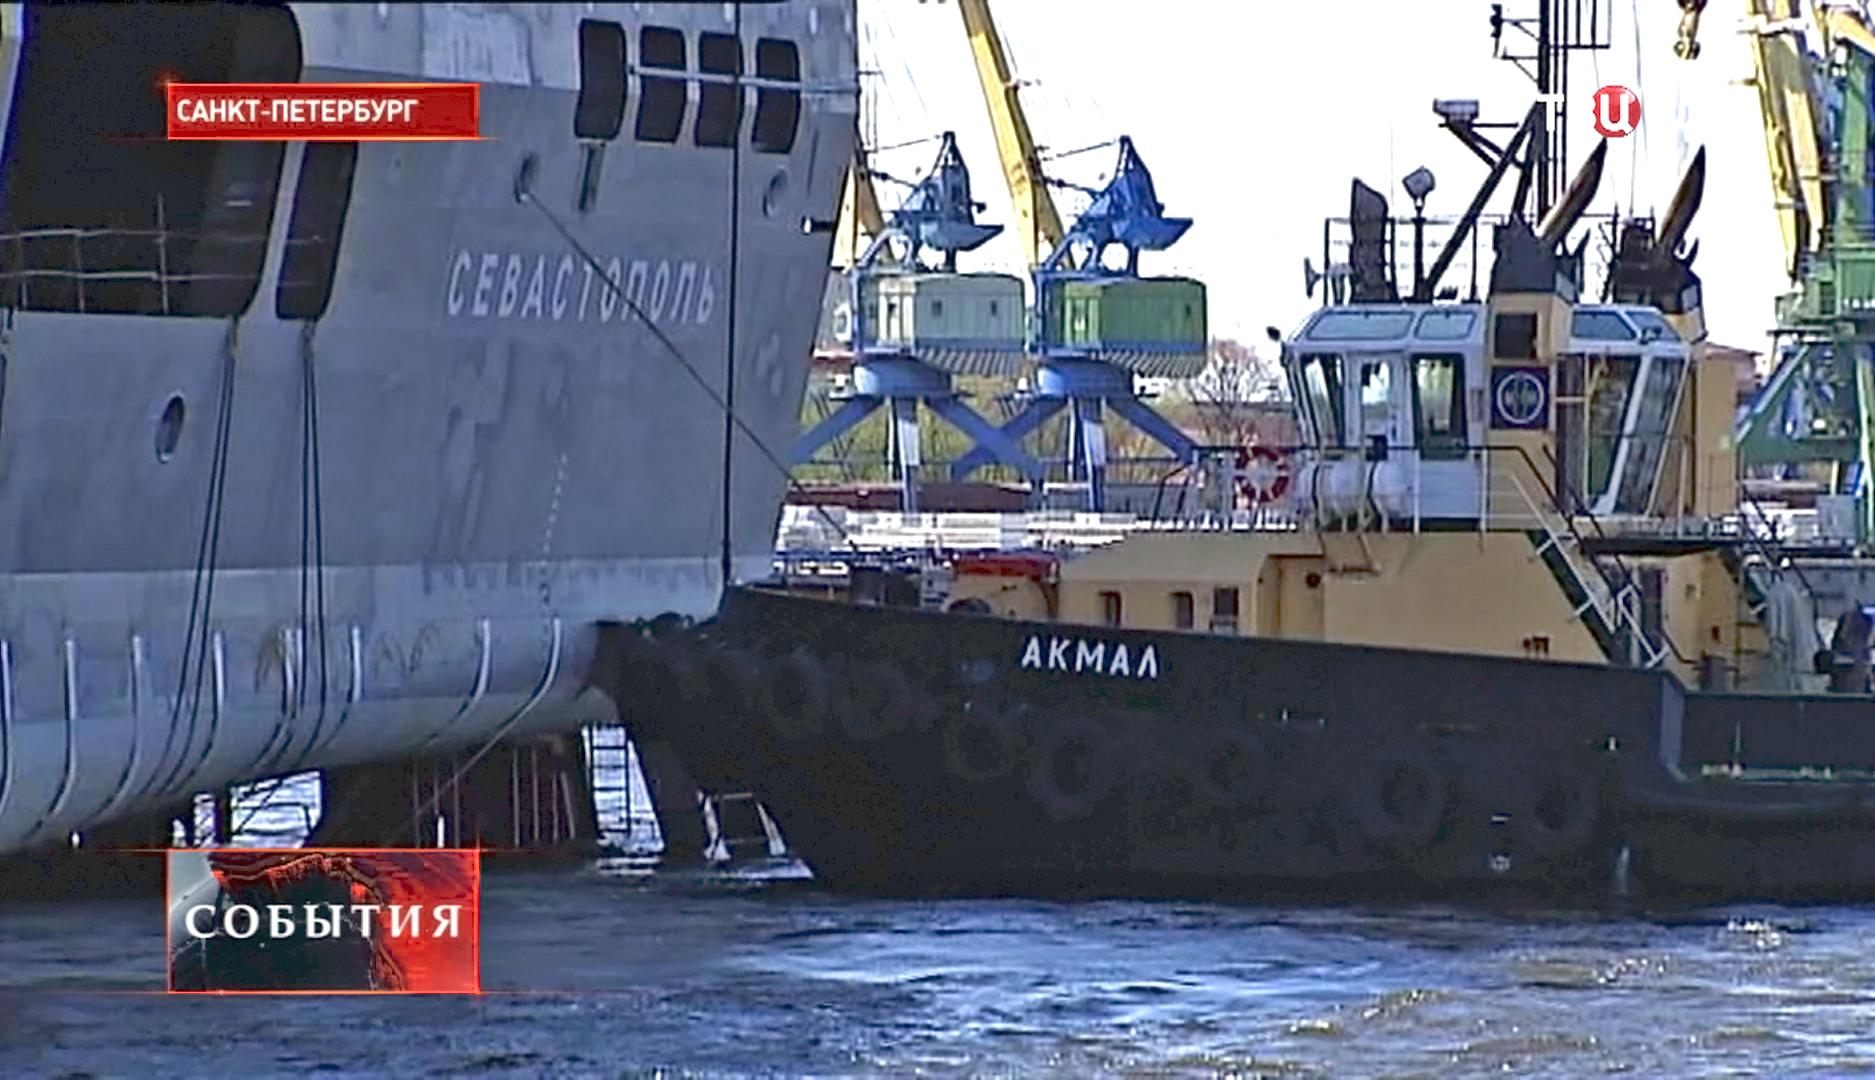 Буксировка судна